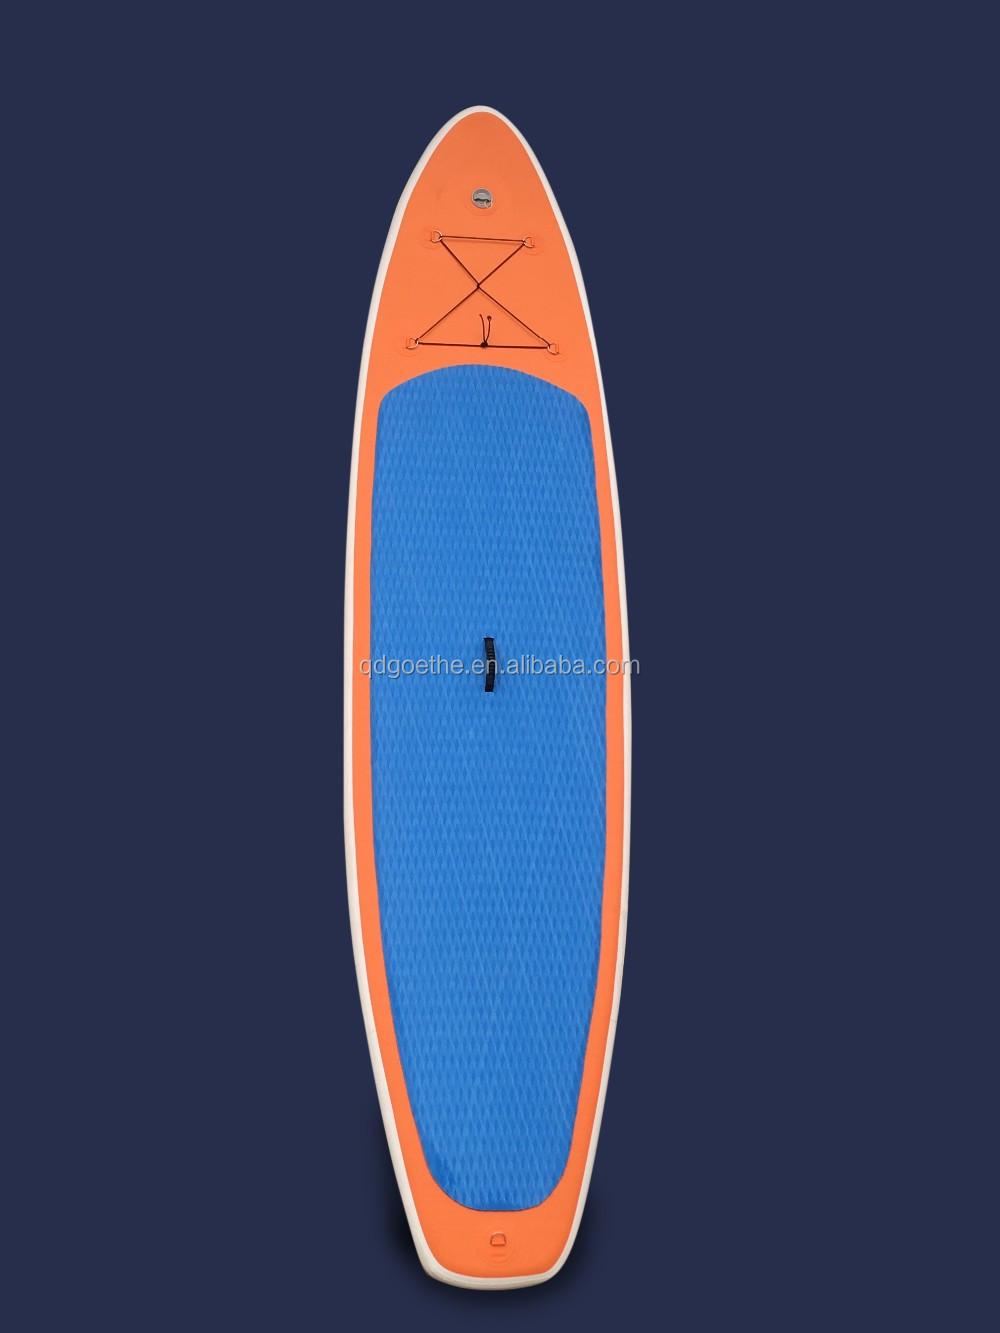 37b5c997f Goethe Direto Da Fábrica de Alta Performance PVC Stand up Paddle Board  Prancha de surf